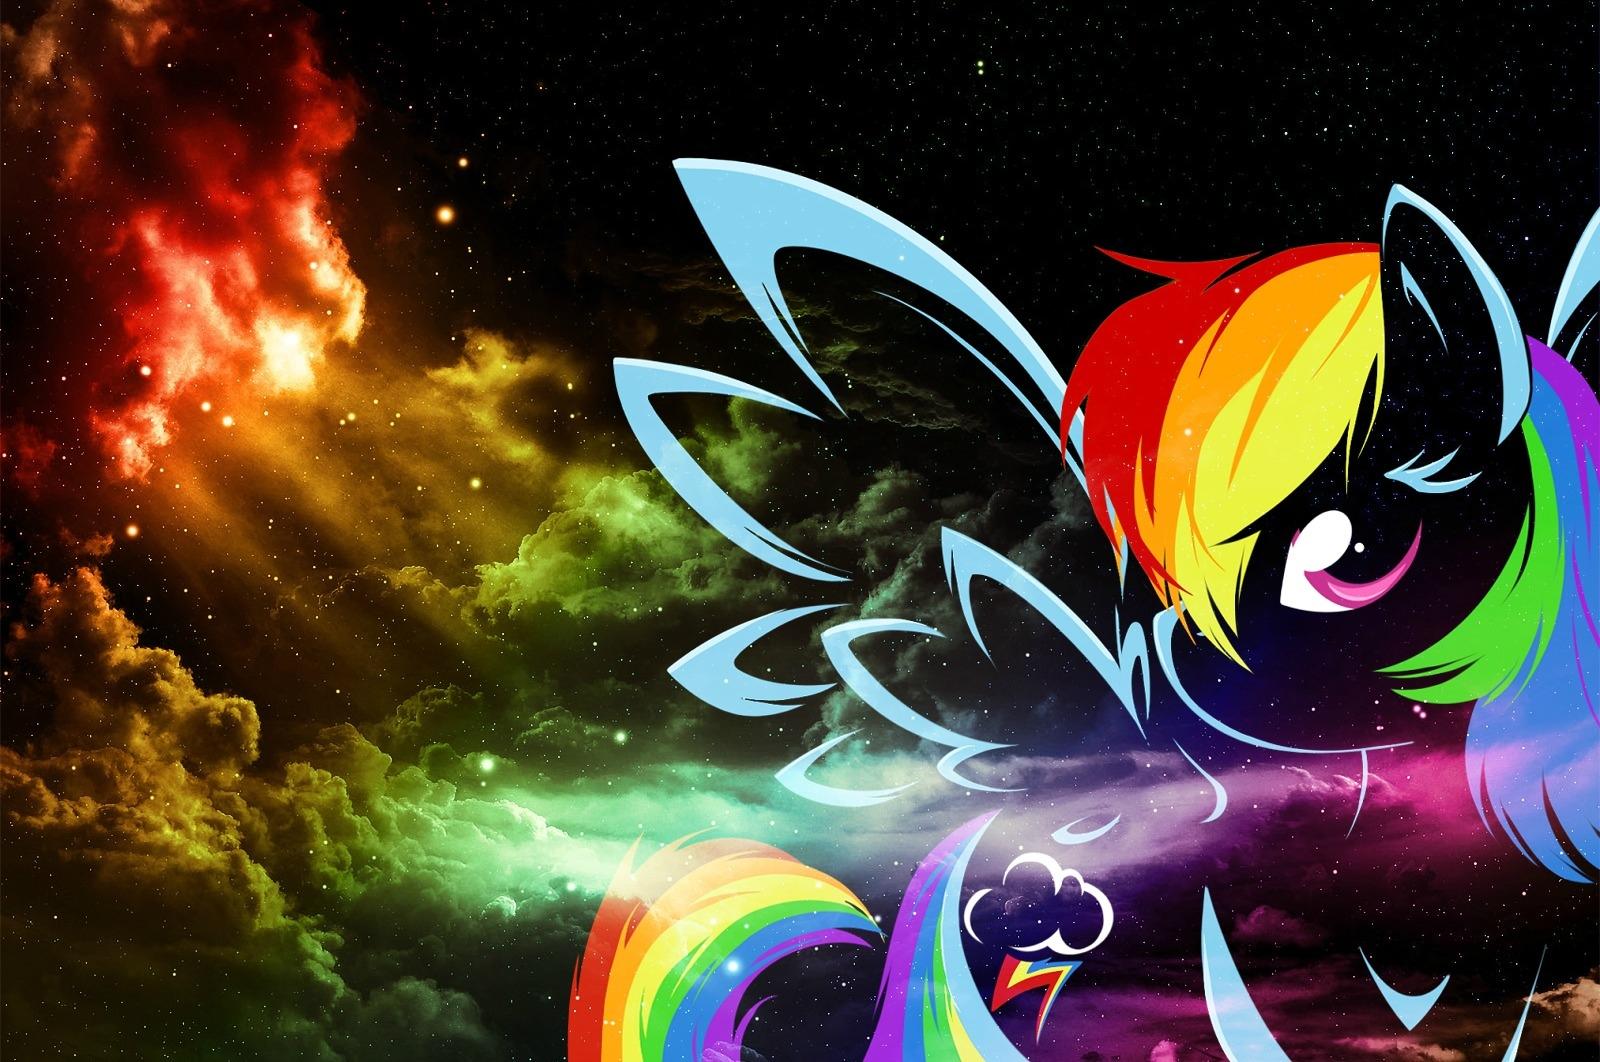 My Little Pony Wallpapers, Fondos de pantalla de Mi ...